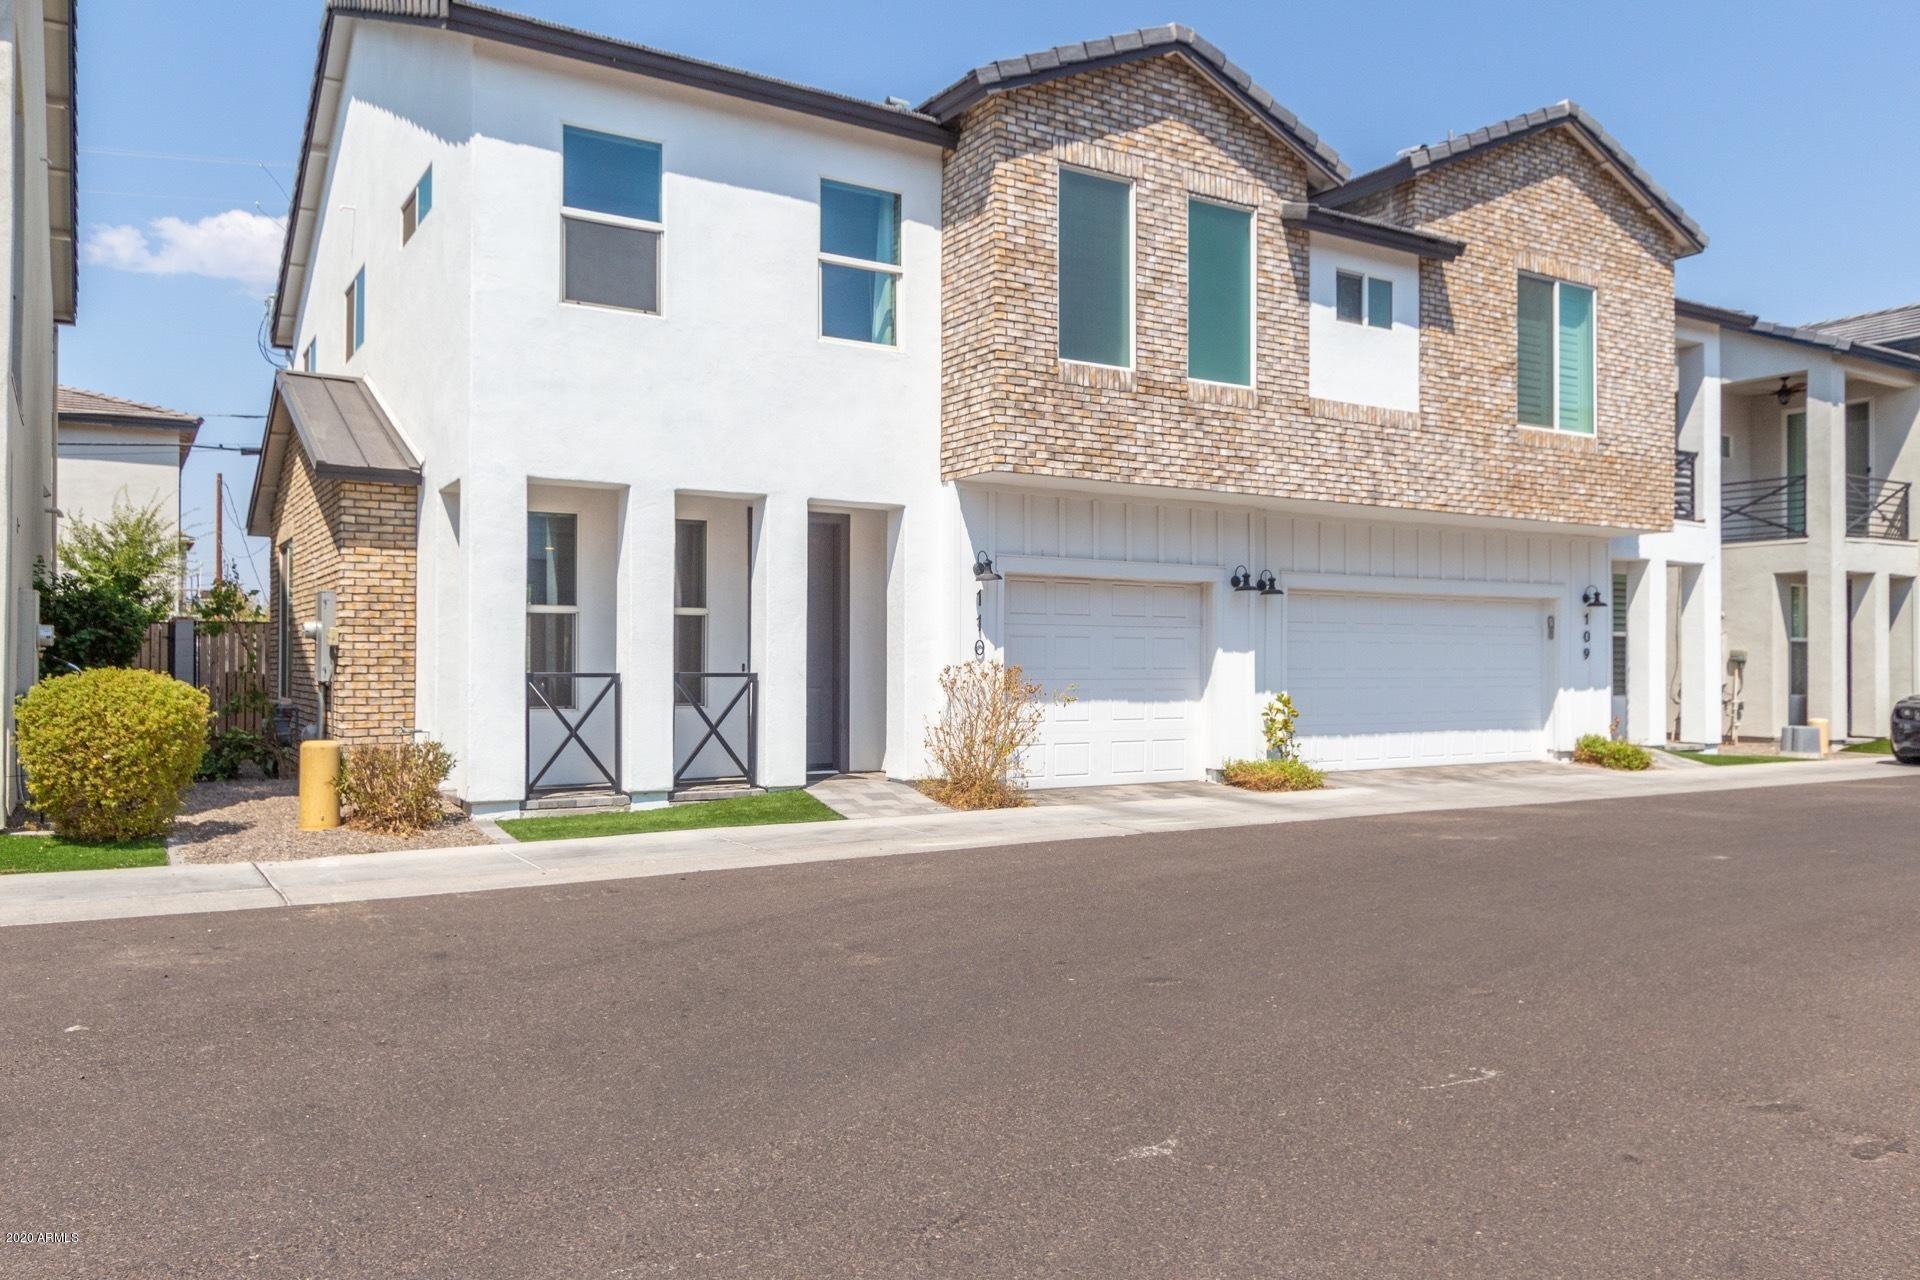 3030 N 38TH Street #E110, Phoenix, AZ 85018 - MLS#: 6119679